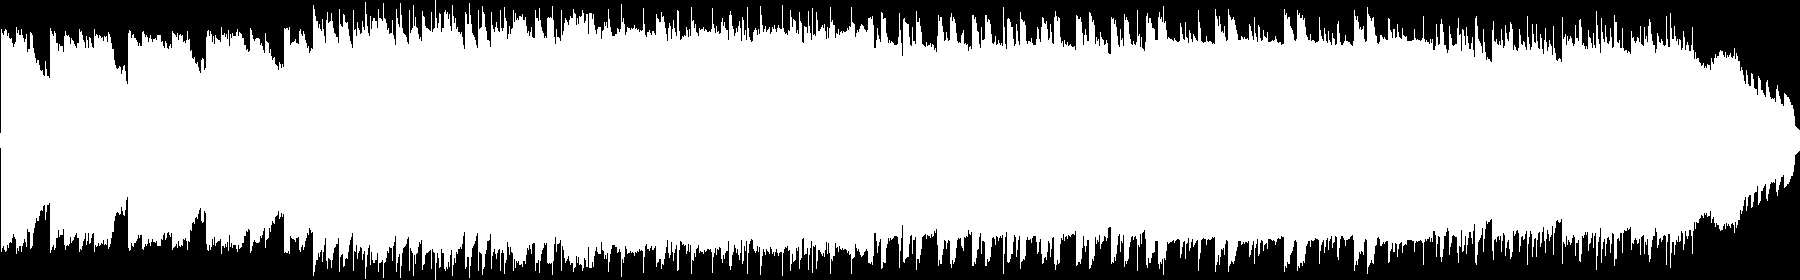 Analog Bass audio waveform